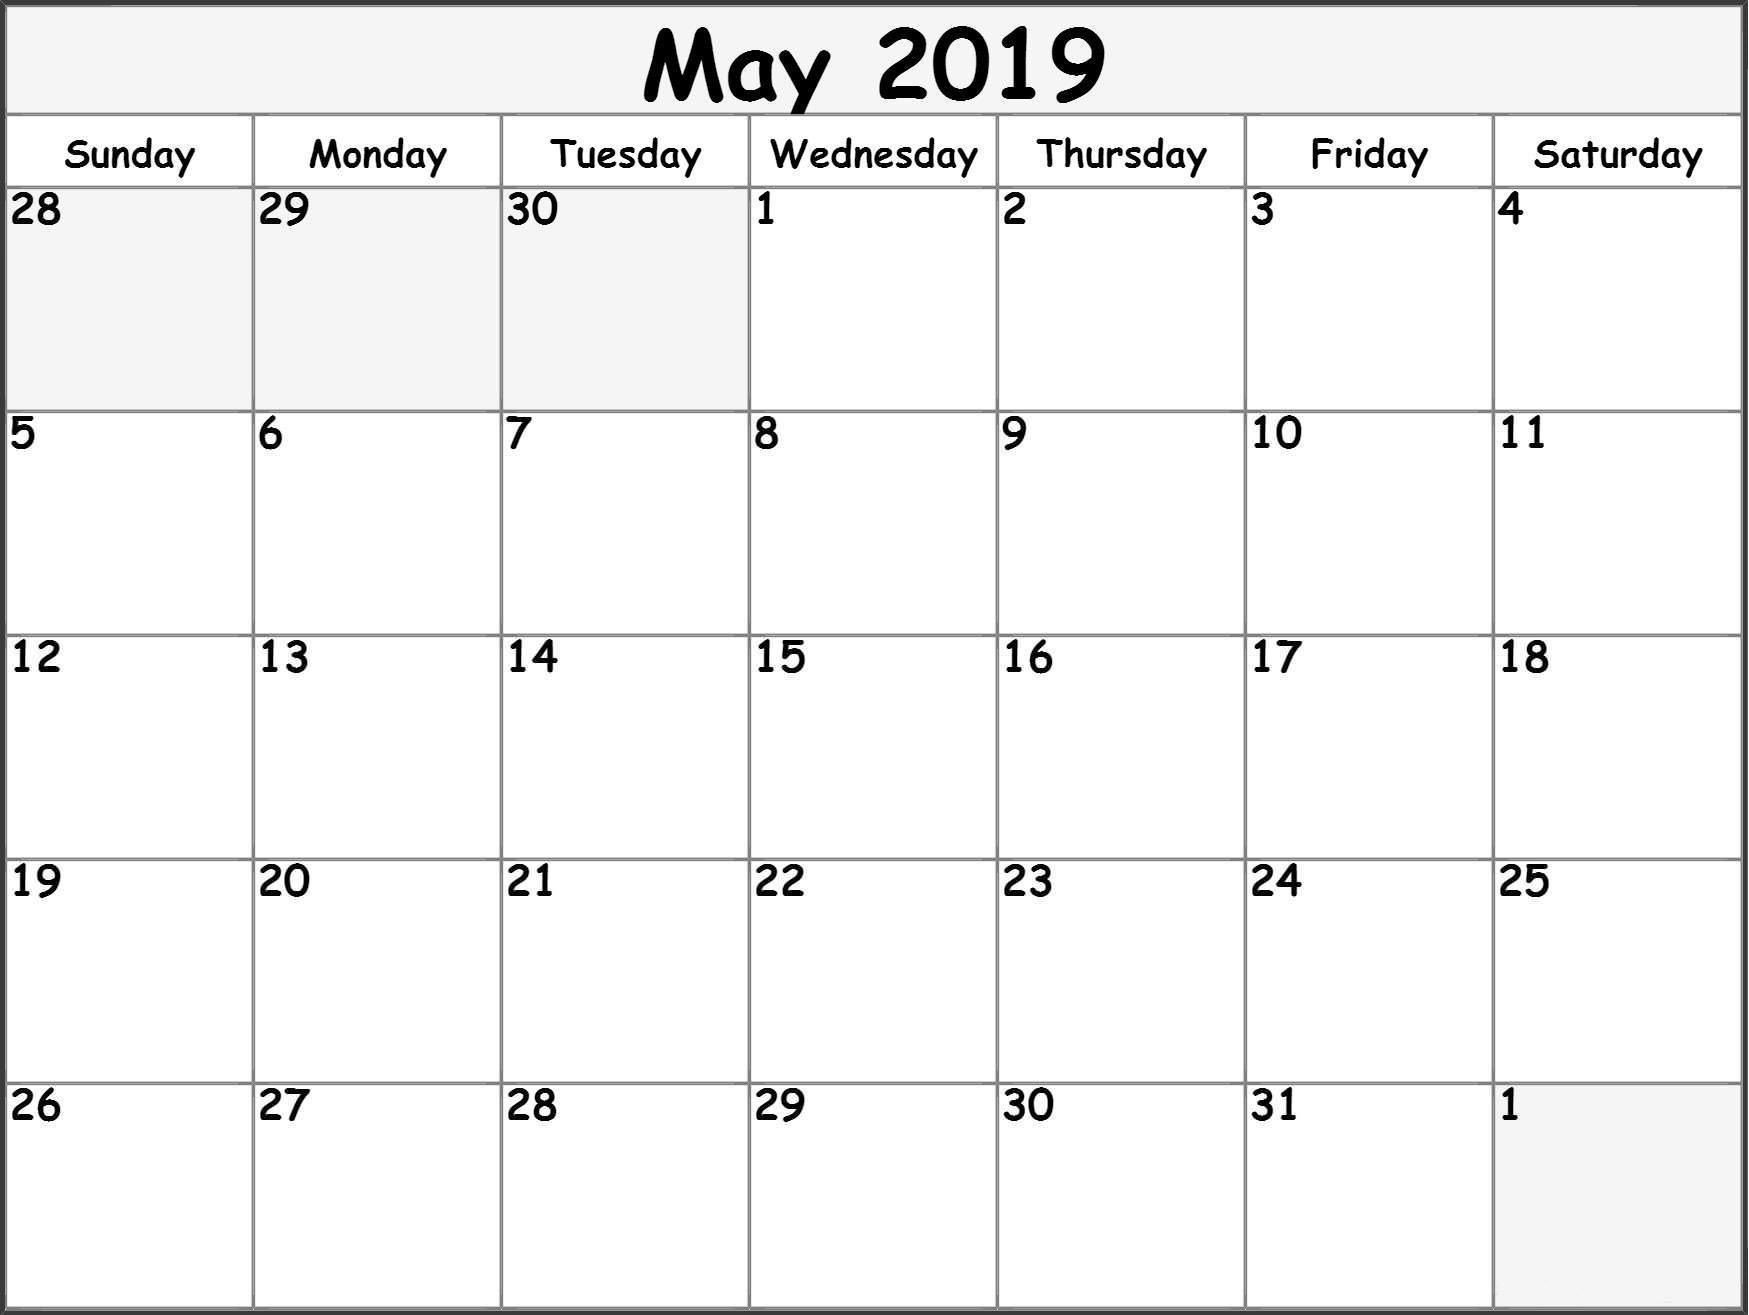 Free Calendar Printables 2019 May 2019 Printable Calendar Templates Free Blank Pdf